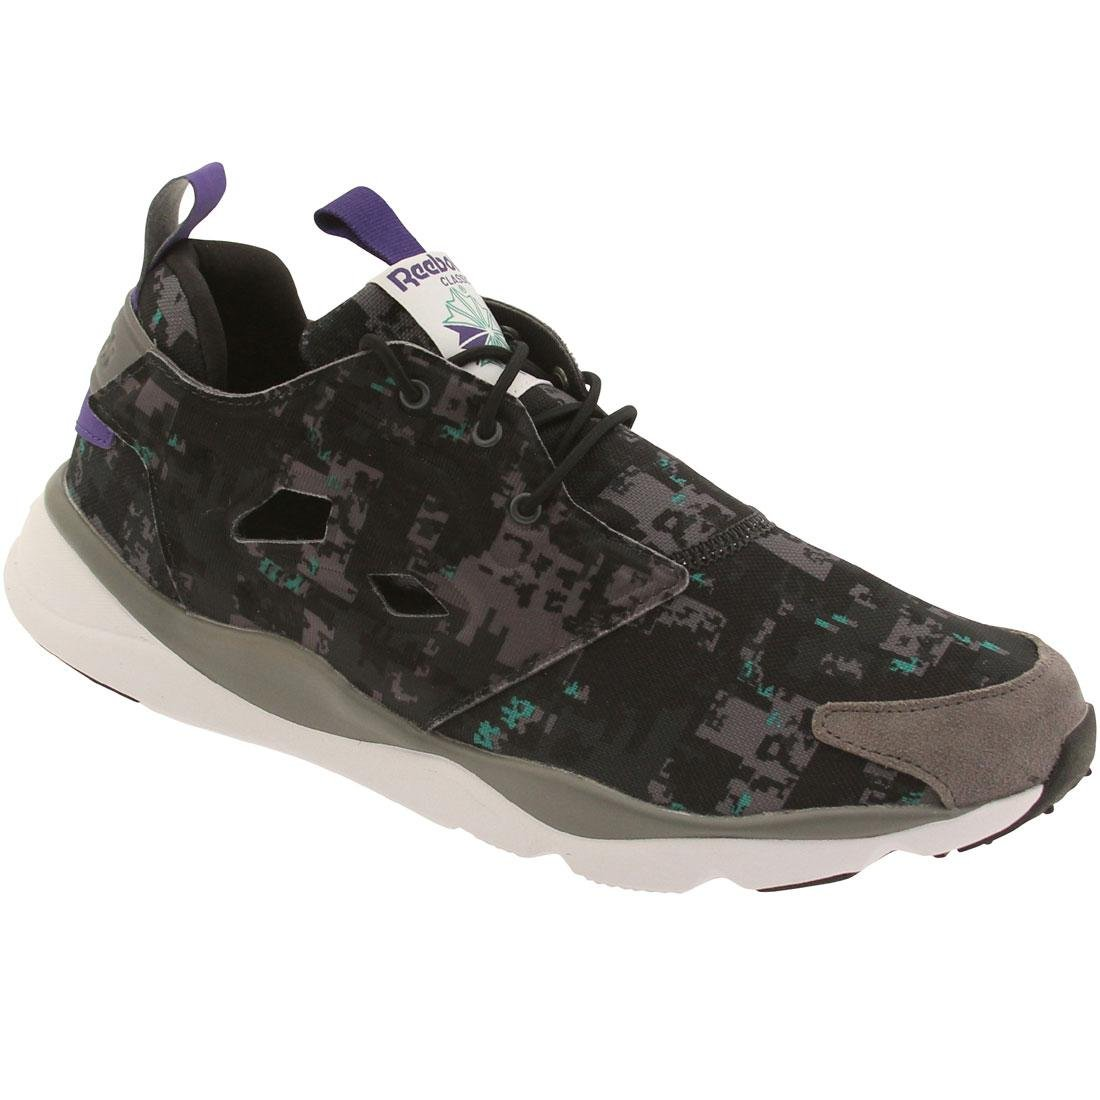 Reebok Lifestyle Men's Furylite SOC Shark/Gravel/Black/Glass Green/White/Team Purple Sneaker 10.5 D (M)